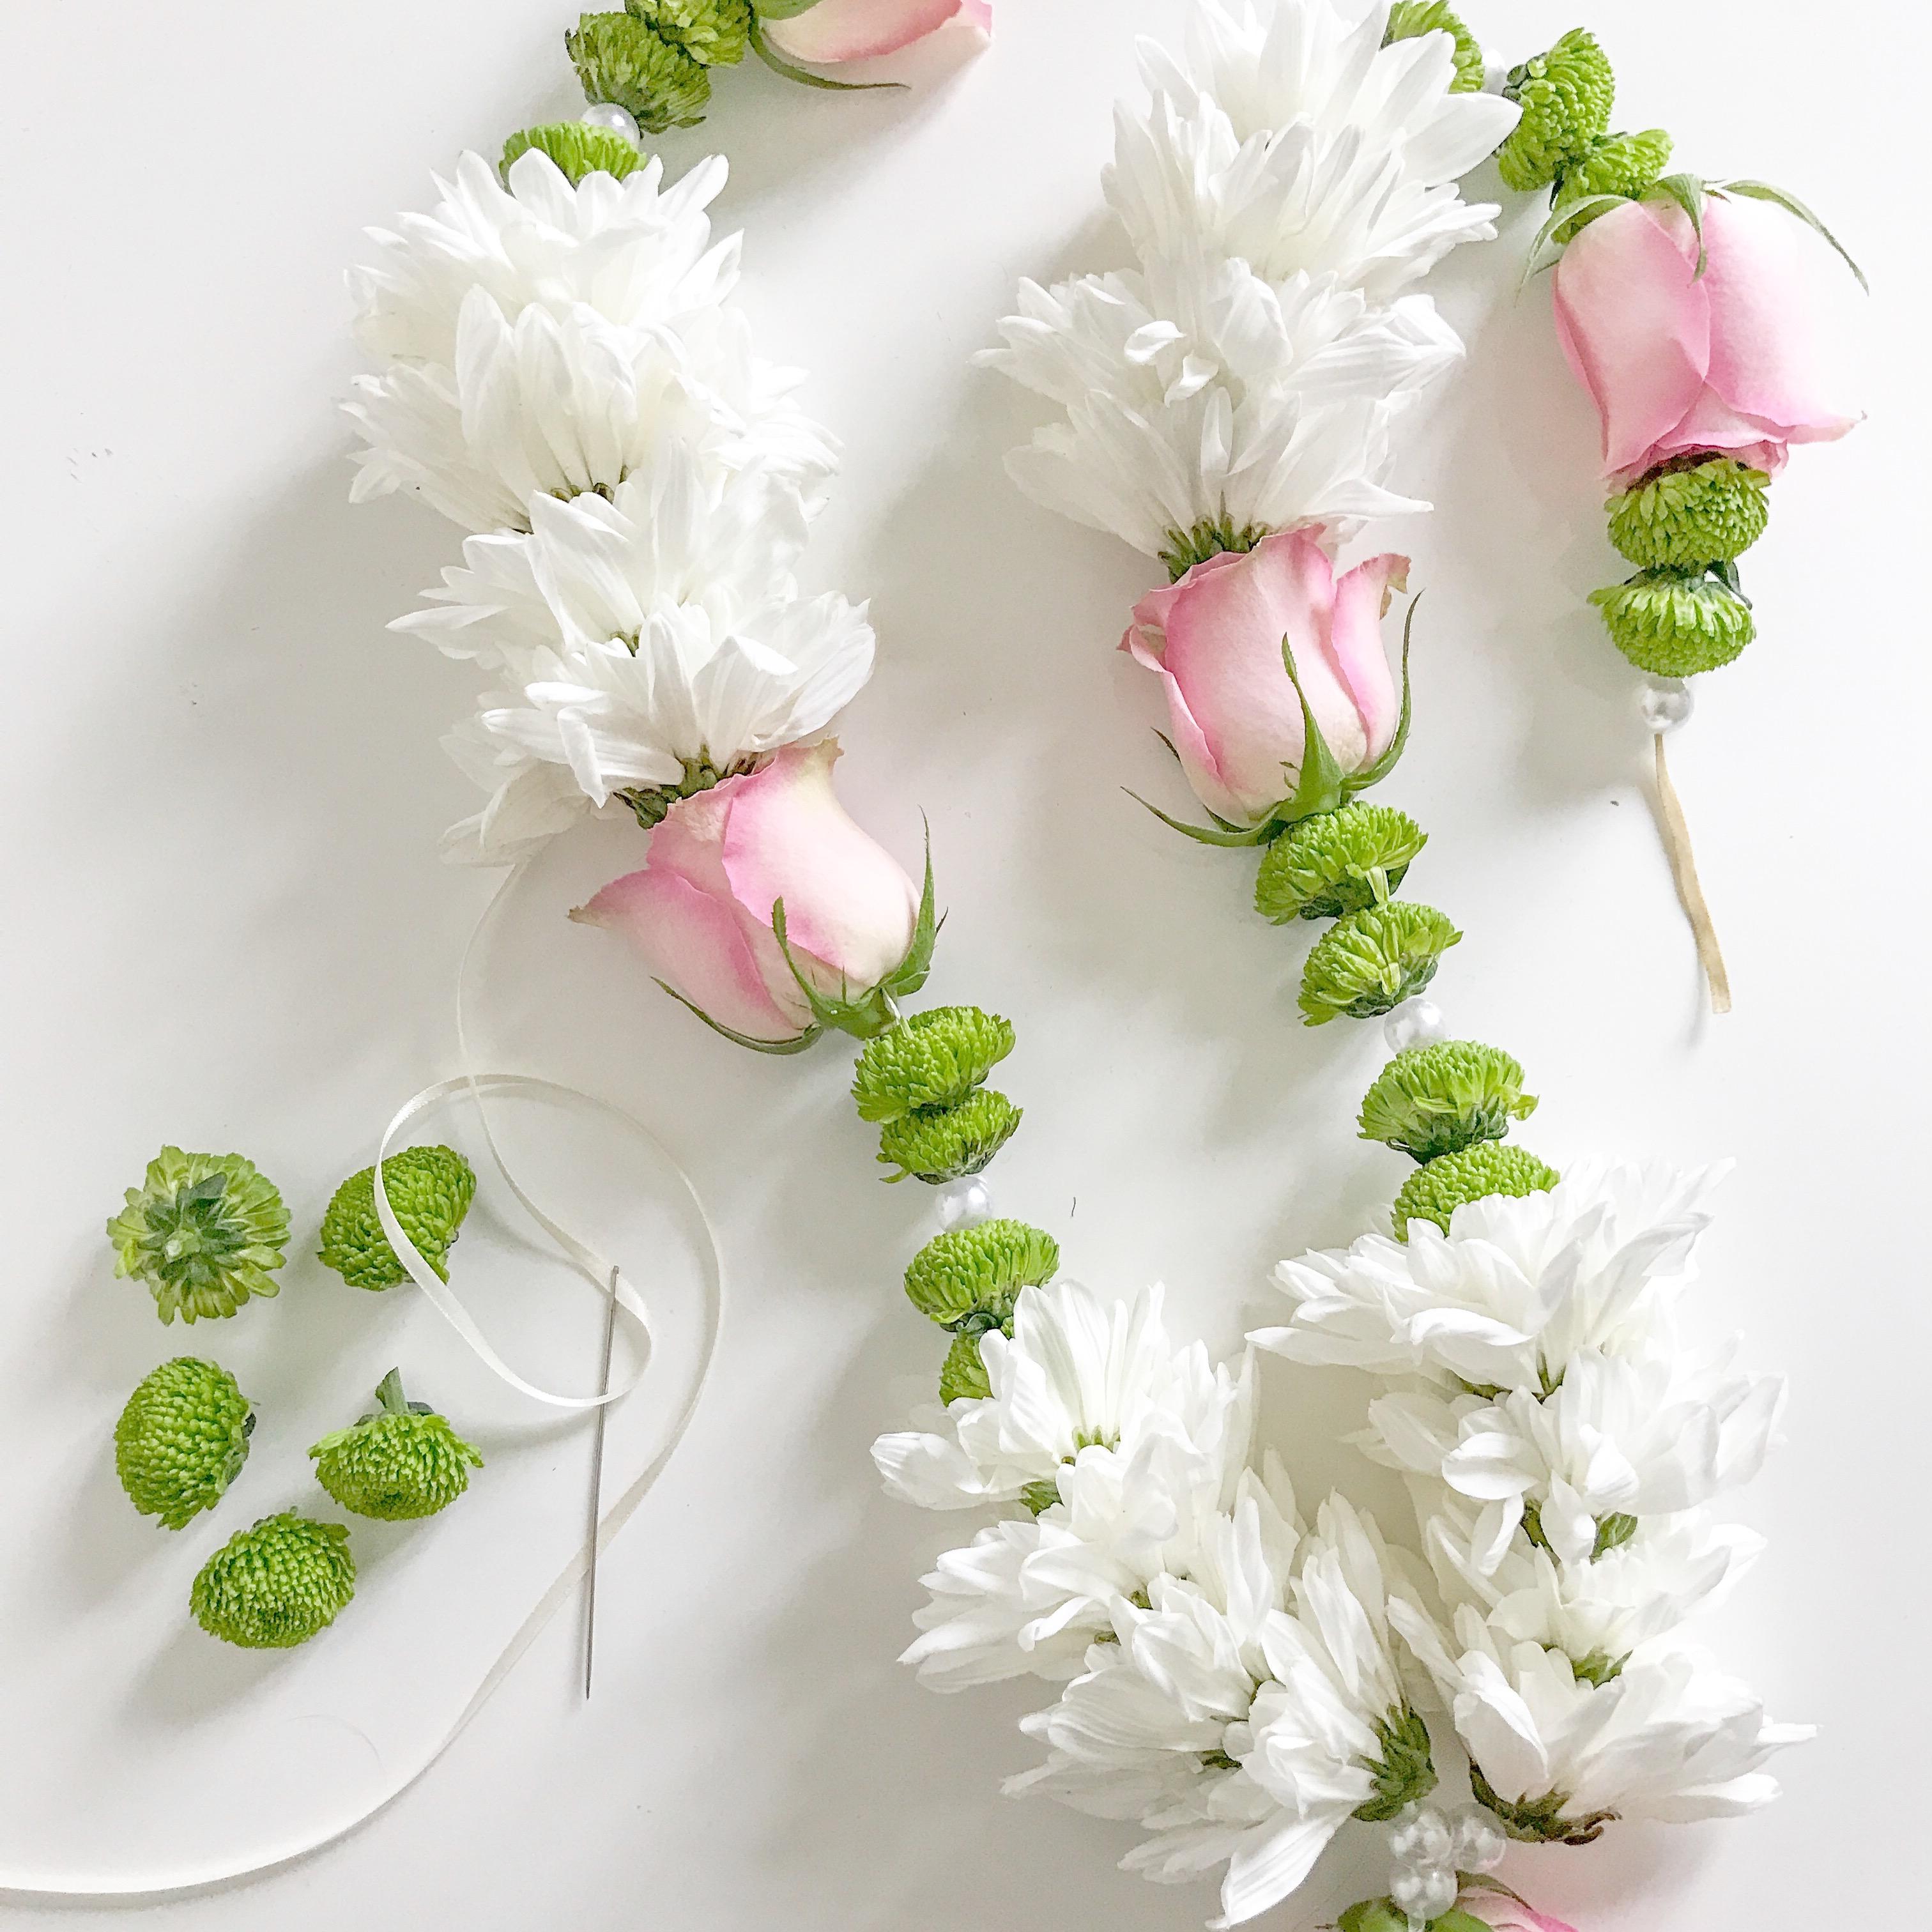 Traditional flower garlands